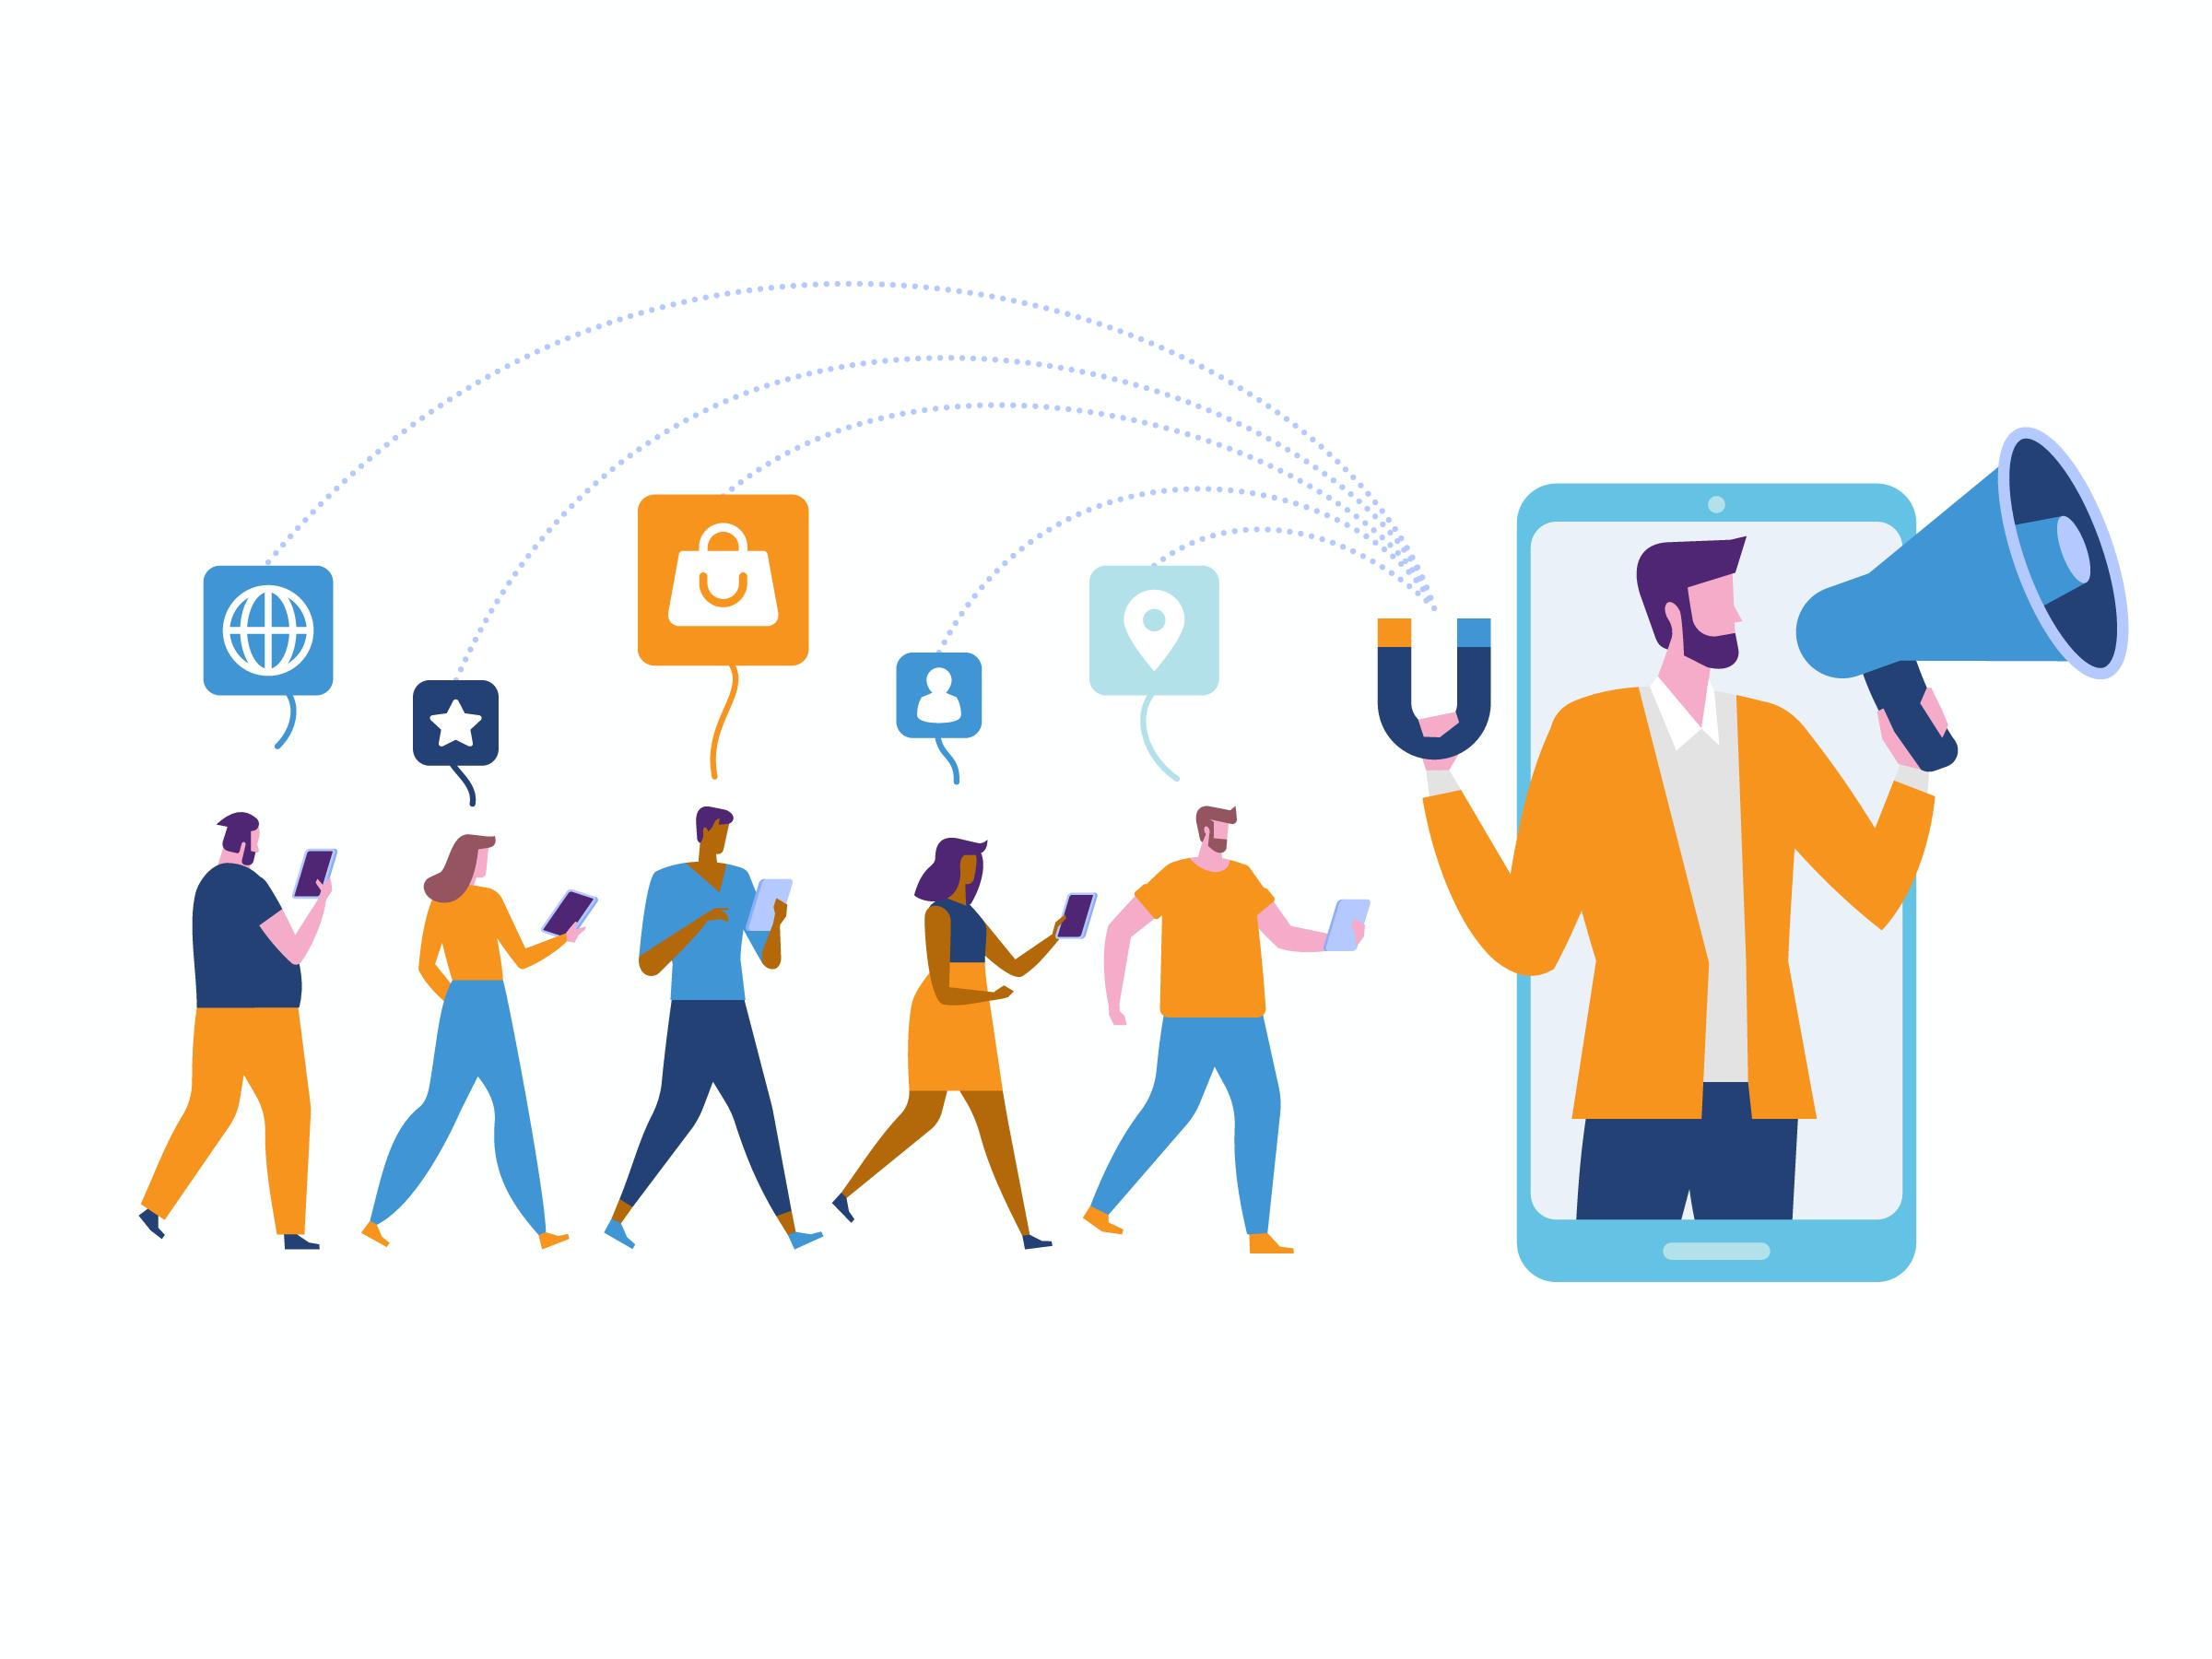 New Study: Marketing to Millennials in 2019